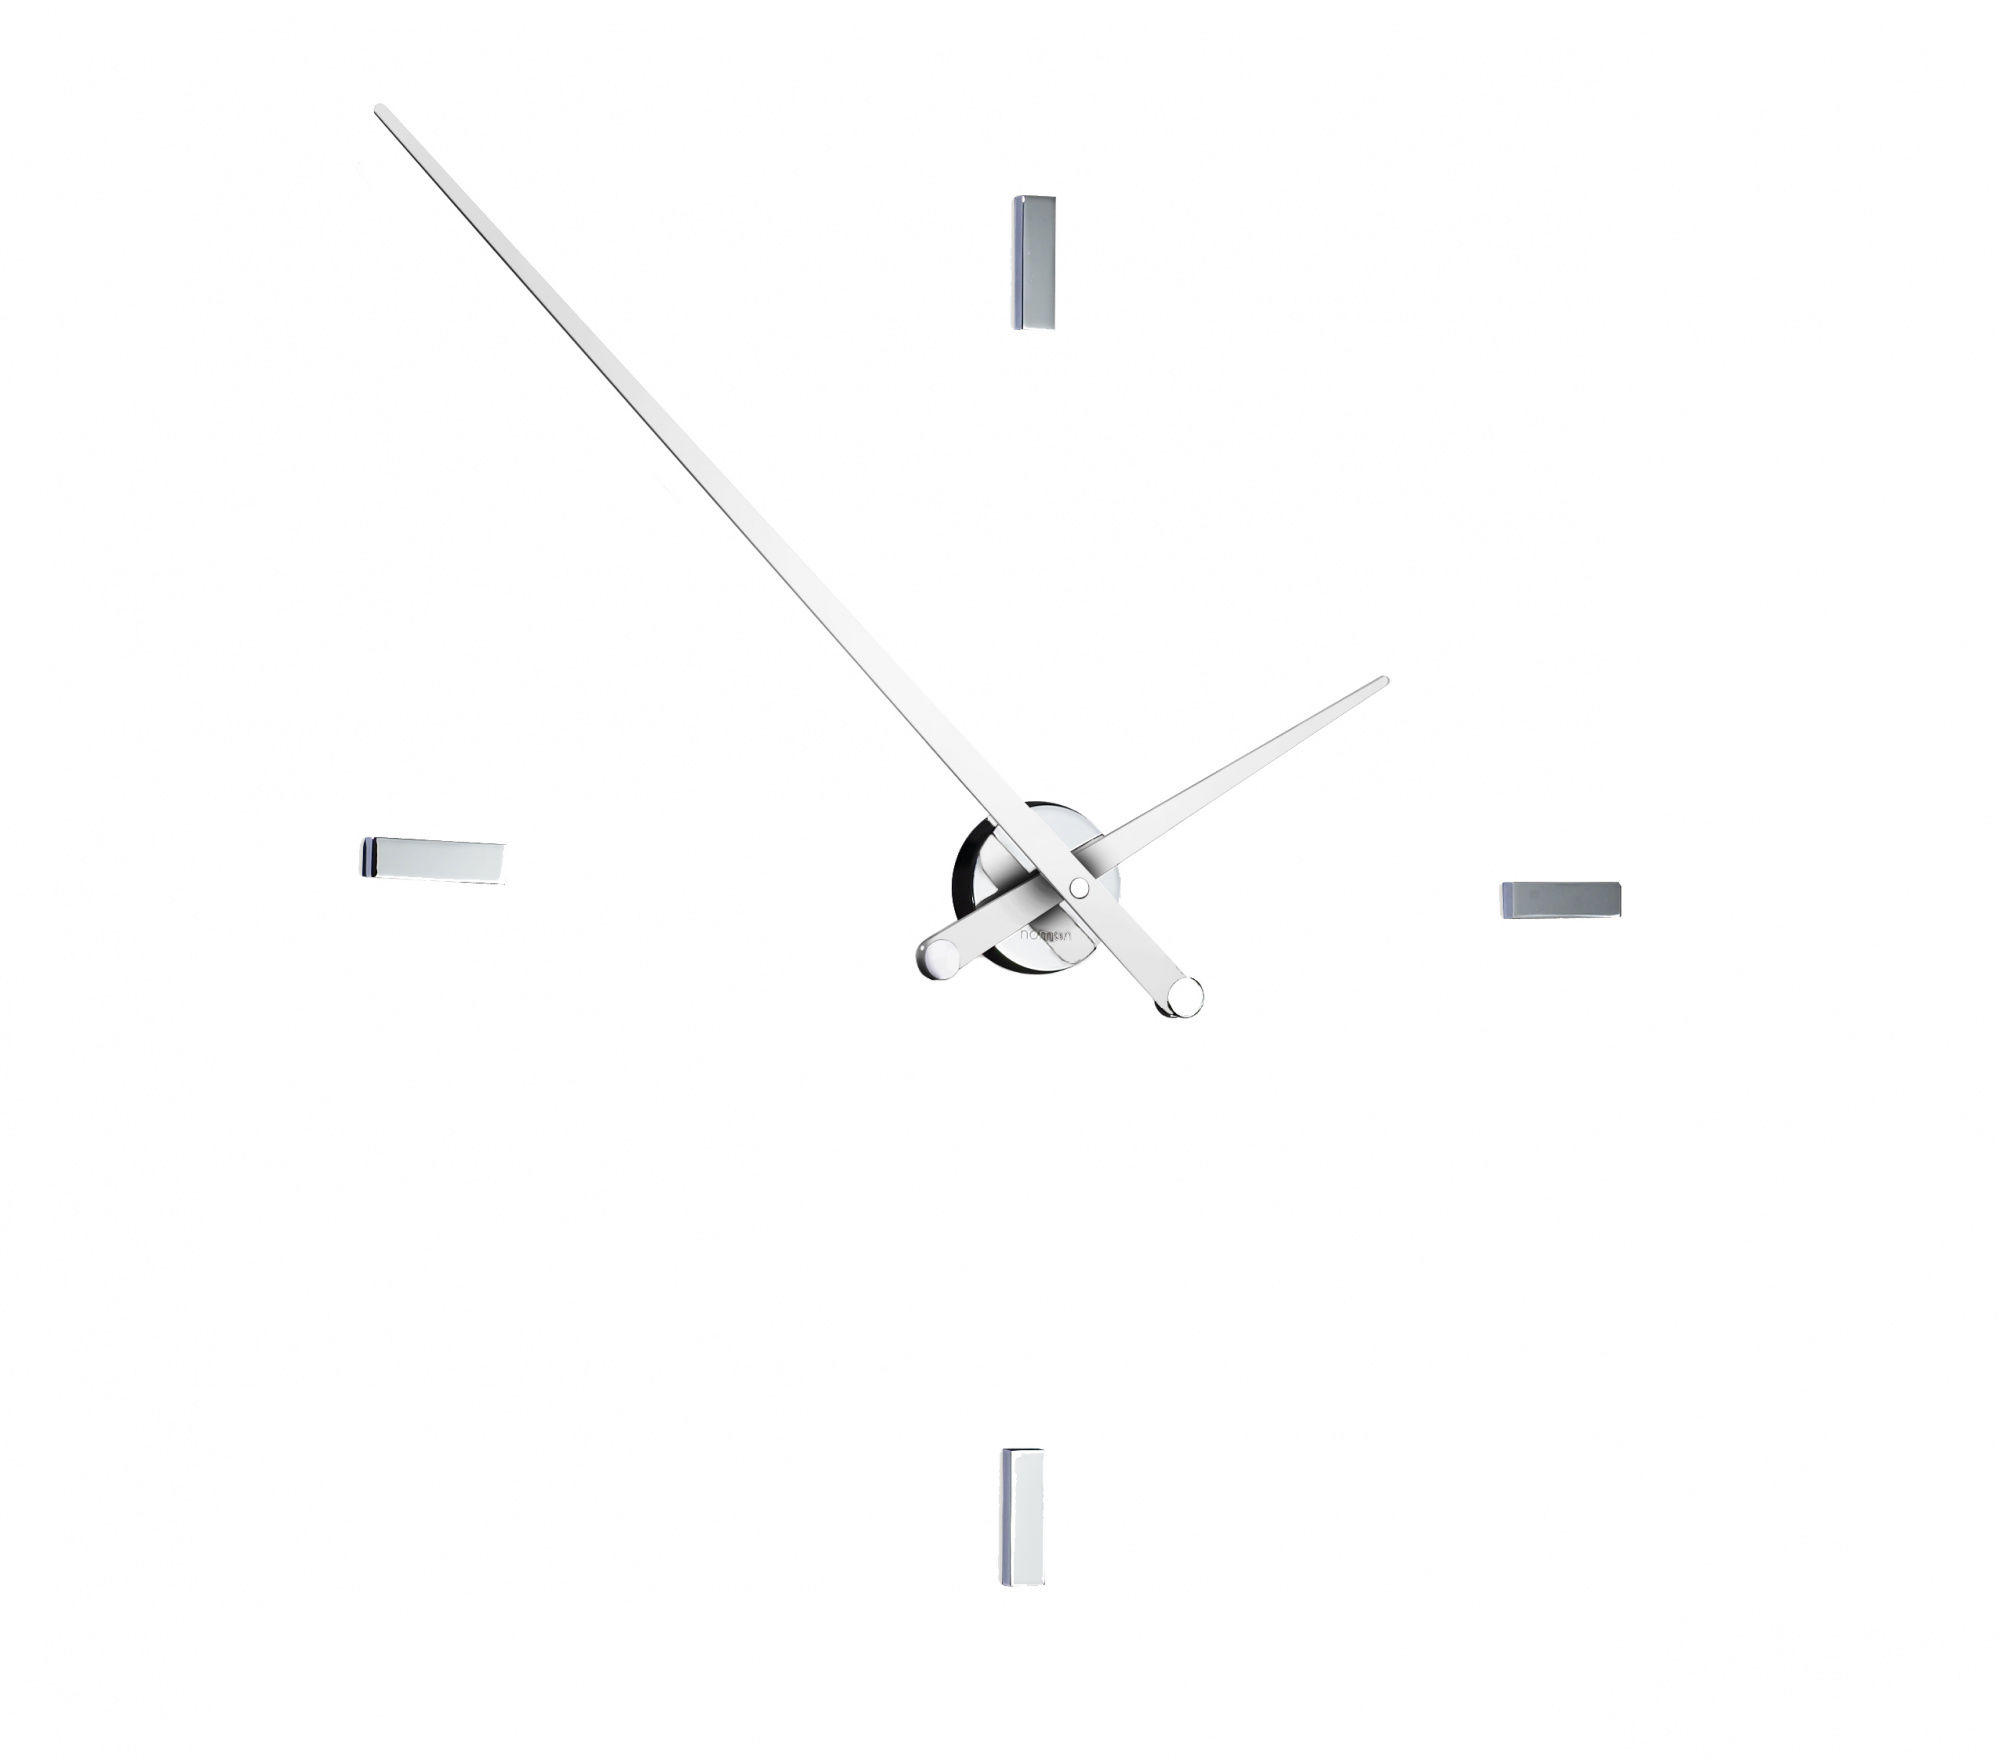 Zegar ścienny Tacón L 4sh Nomon różne kolory